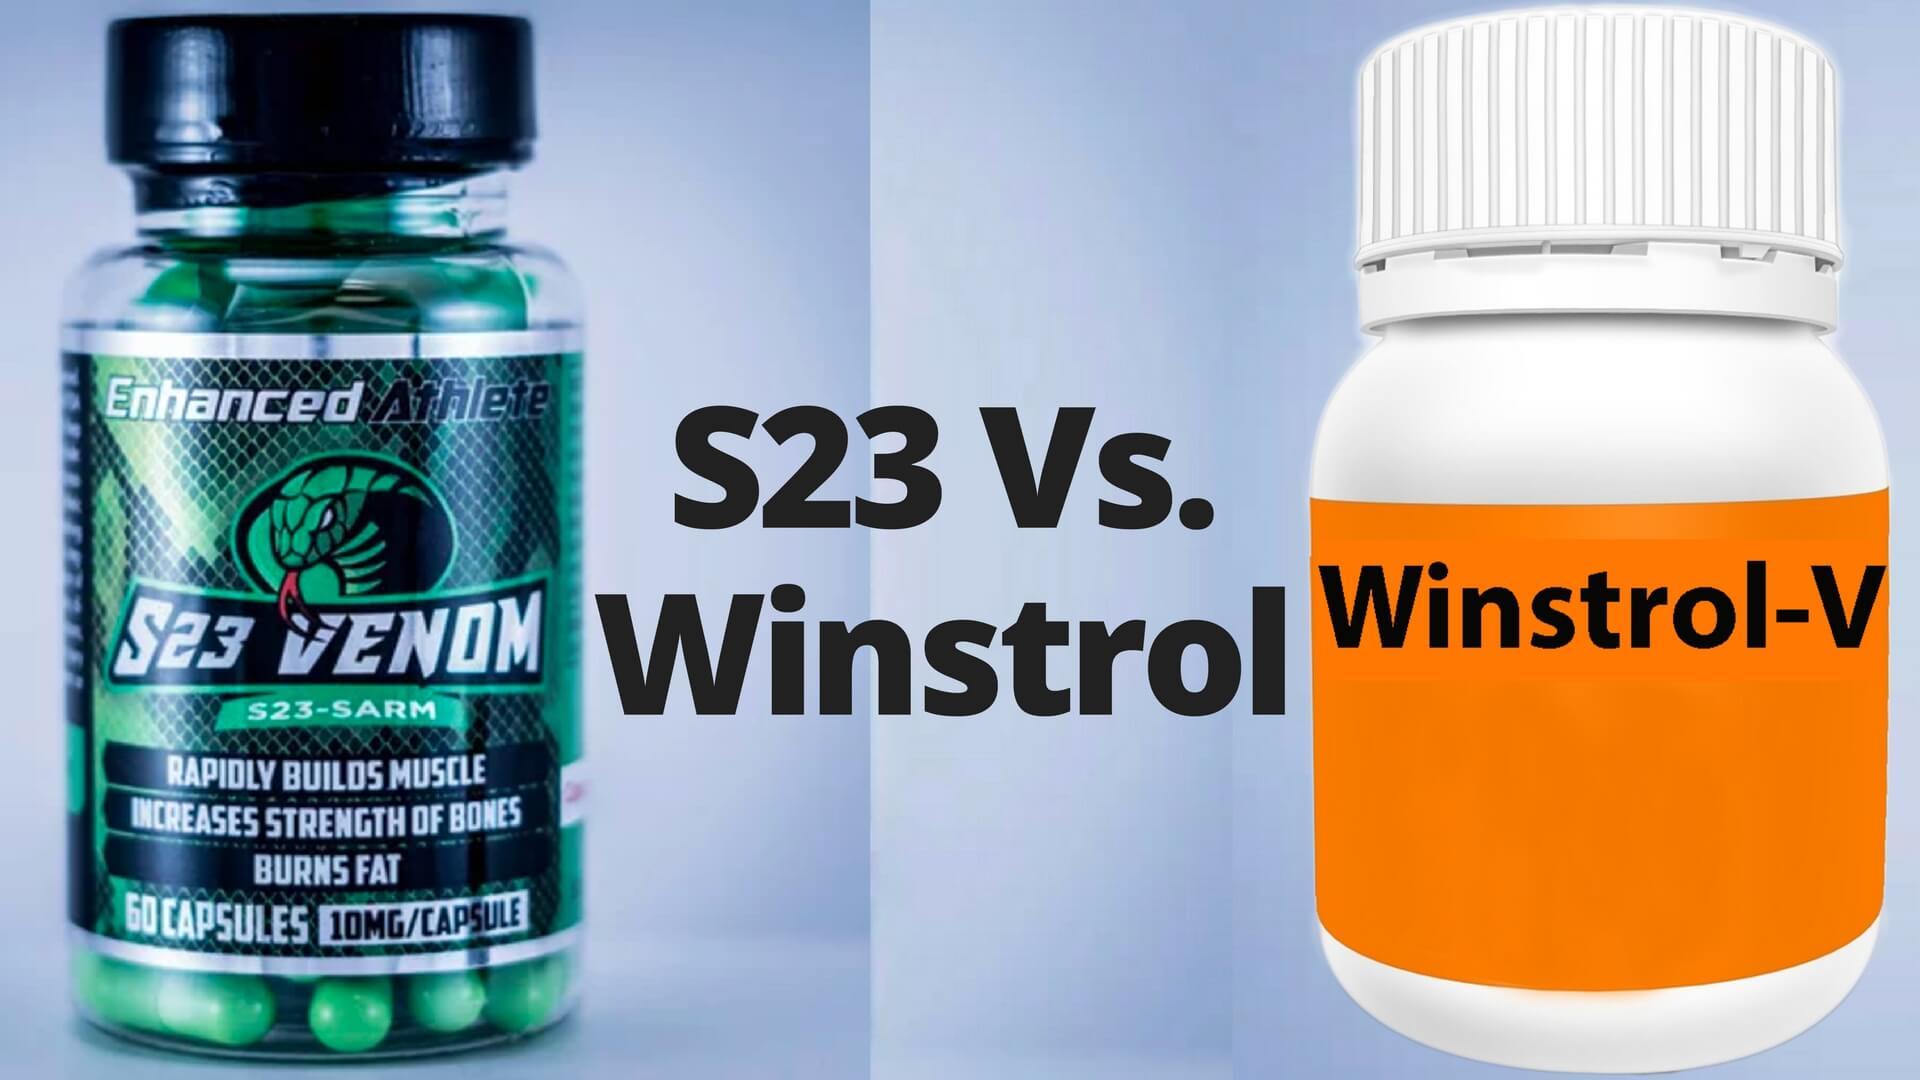 SARM S23 Vs Winstrol Comparison - Viable Winstrol Alternative?